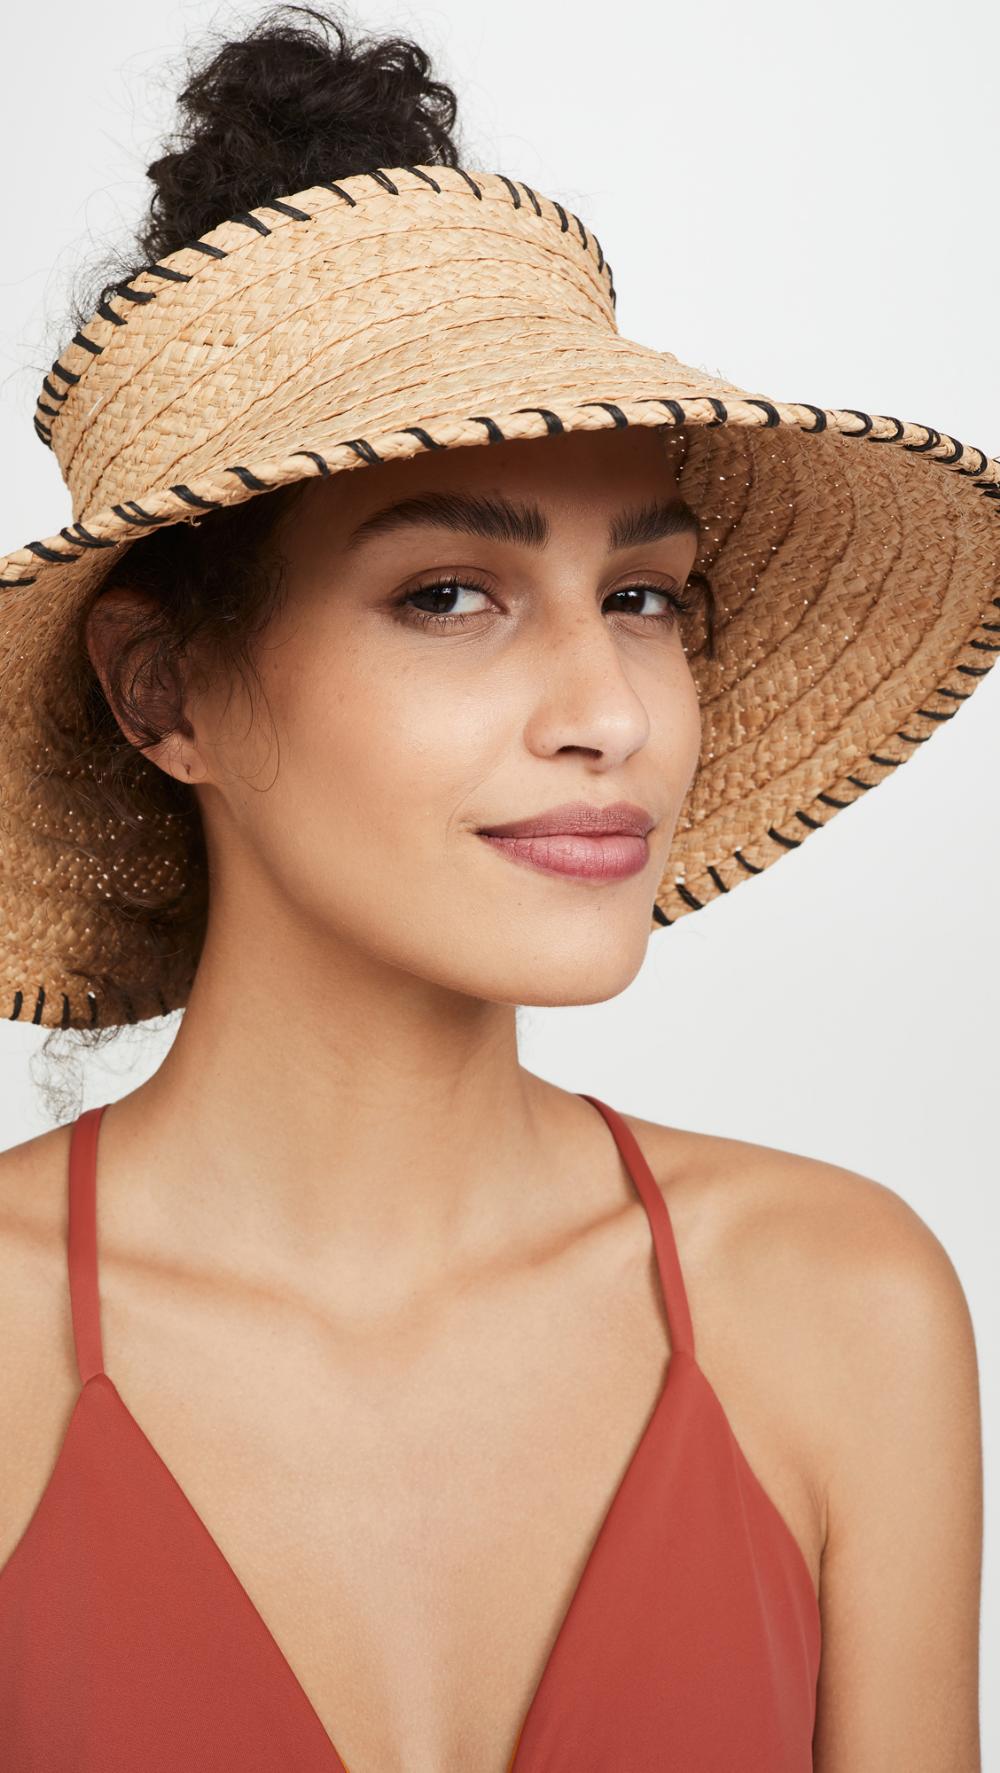 Hat Attack Mini Roll Up Visor Vacation Outfits Women Beachwear Fashion Mini Rolls